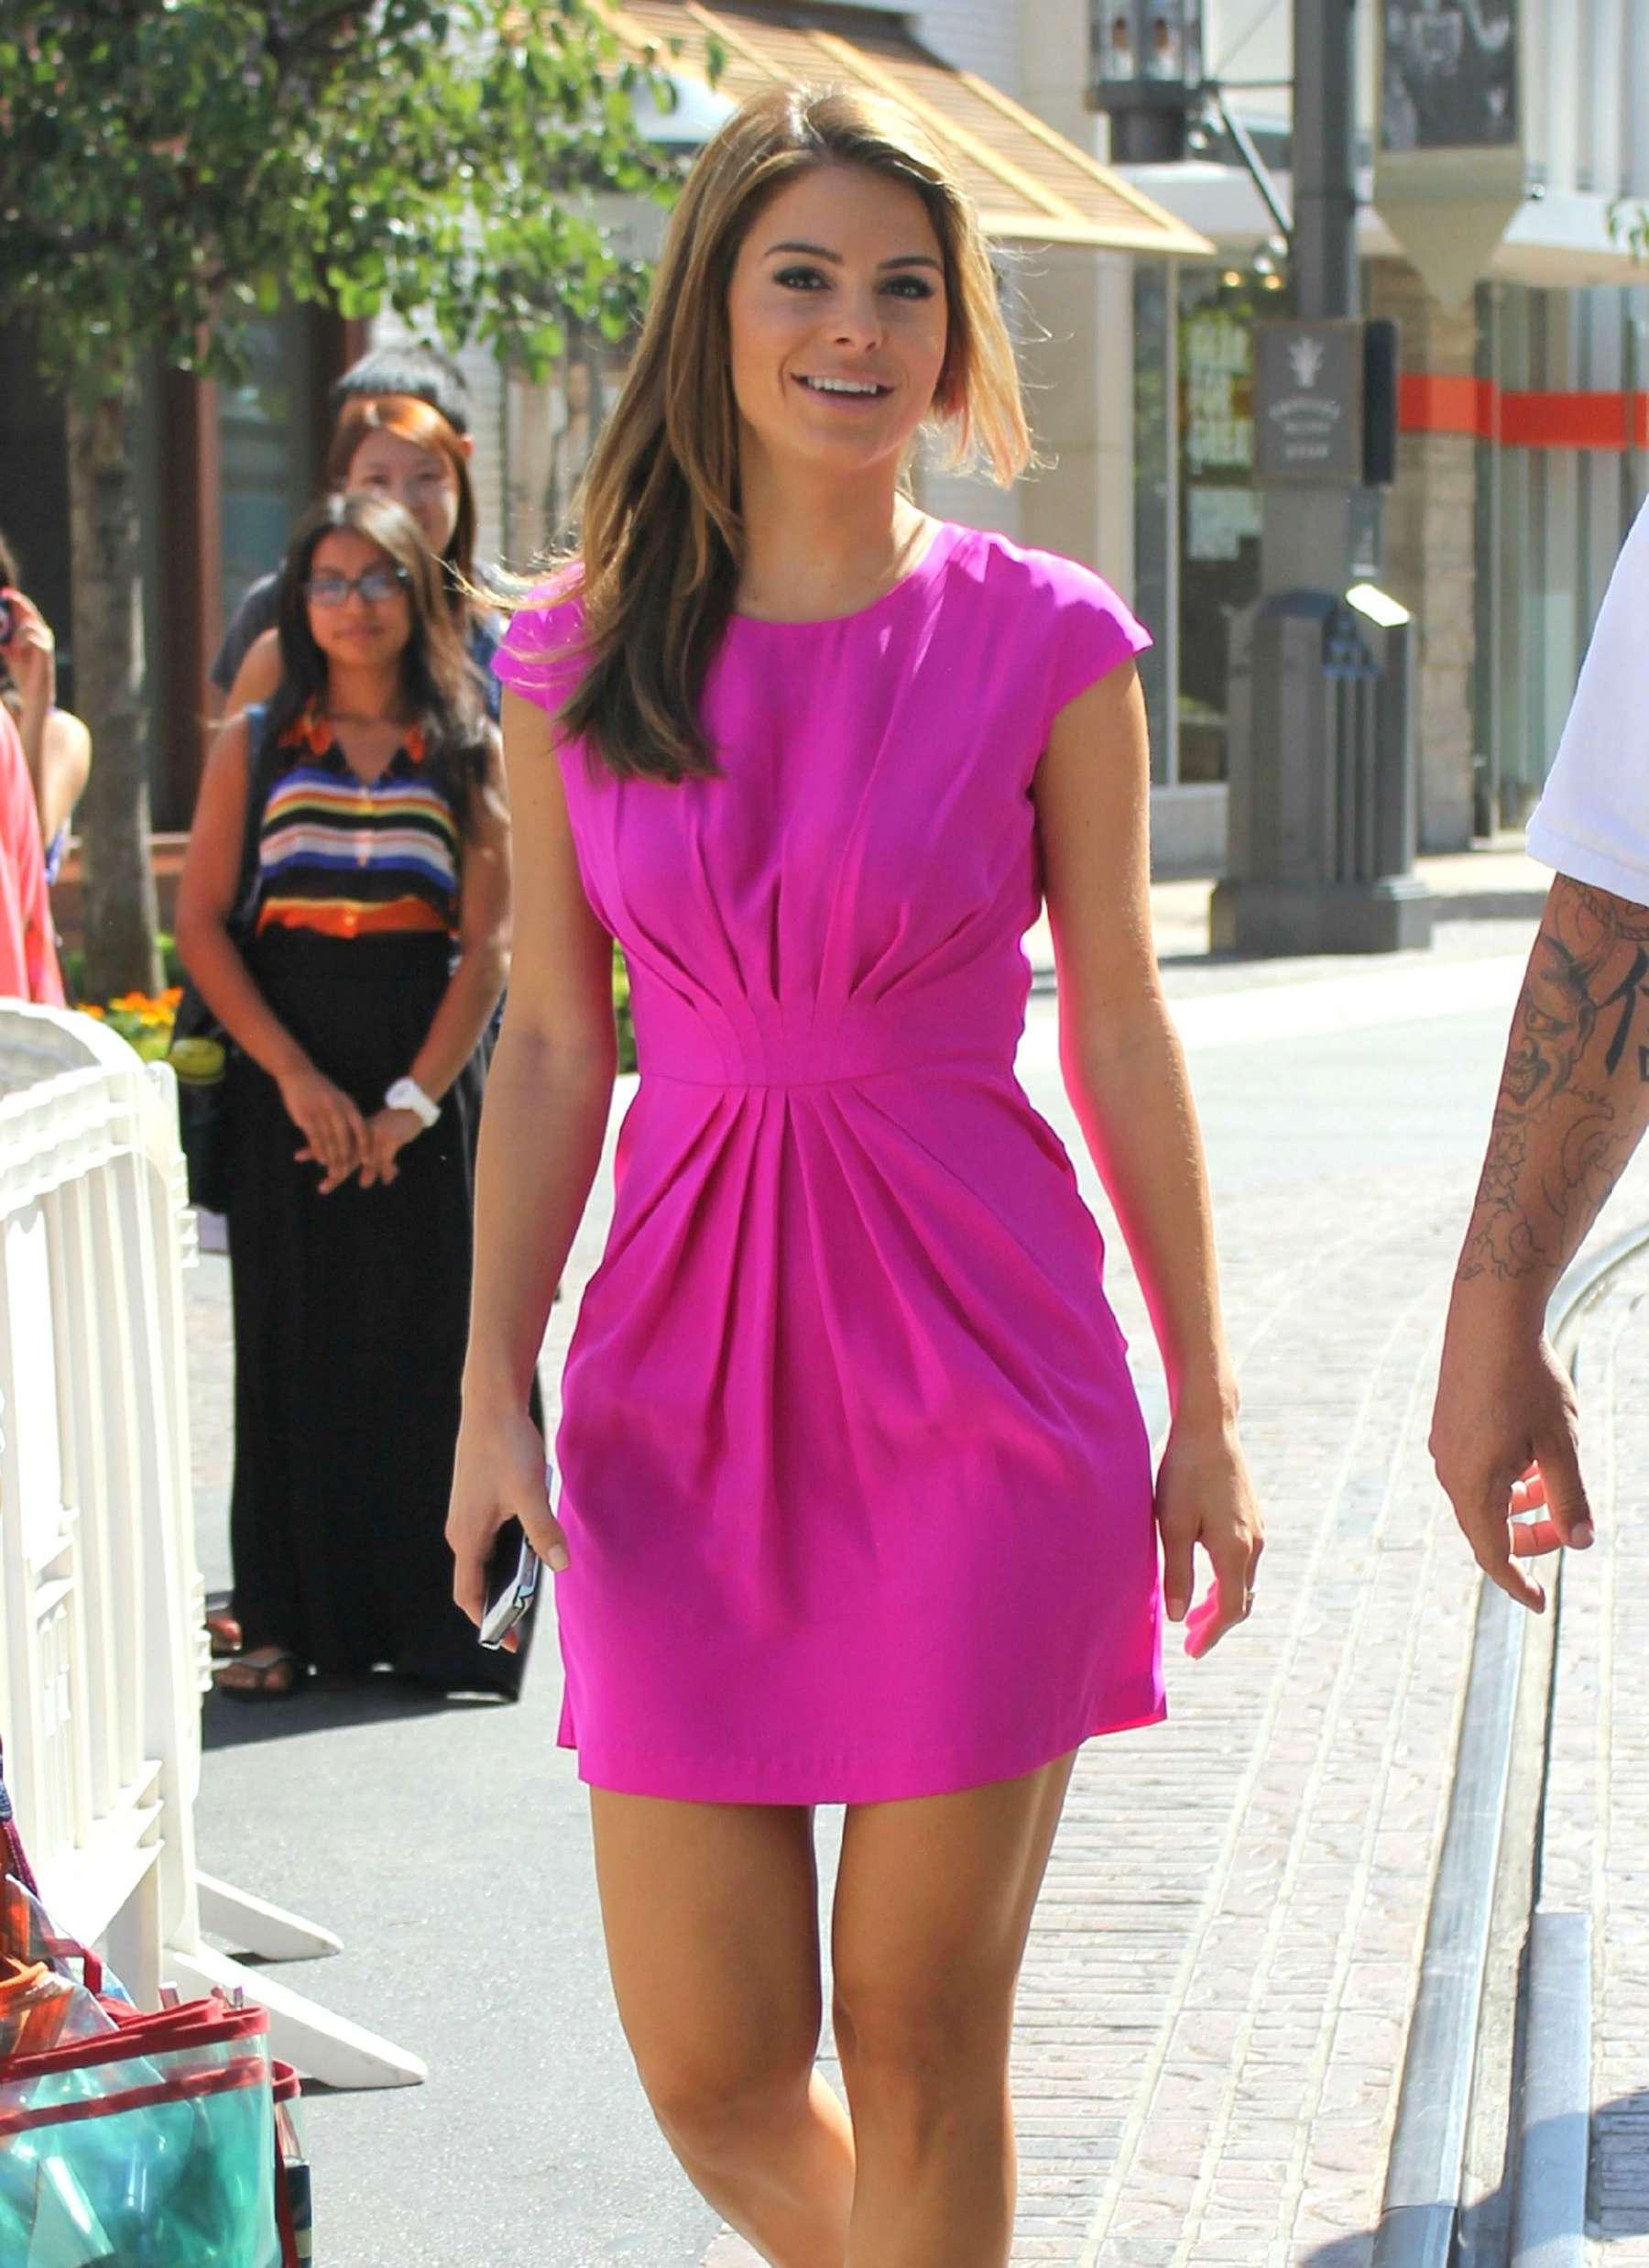 Maria Menounos Legs In Short Dress 06 Full Size